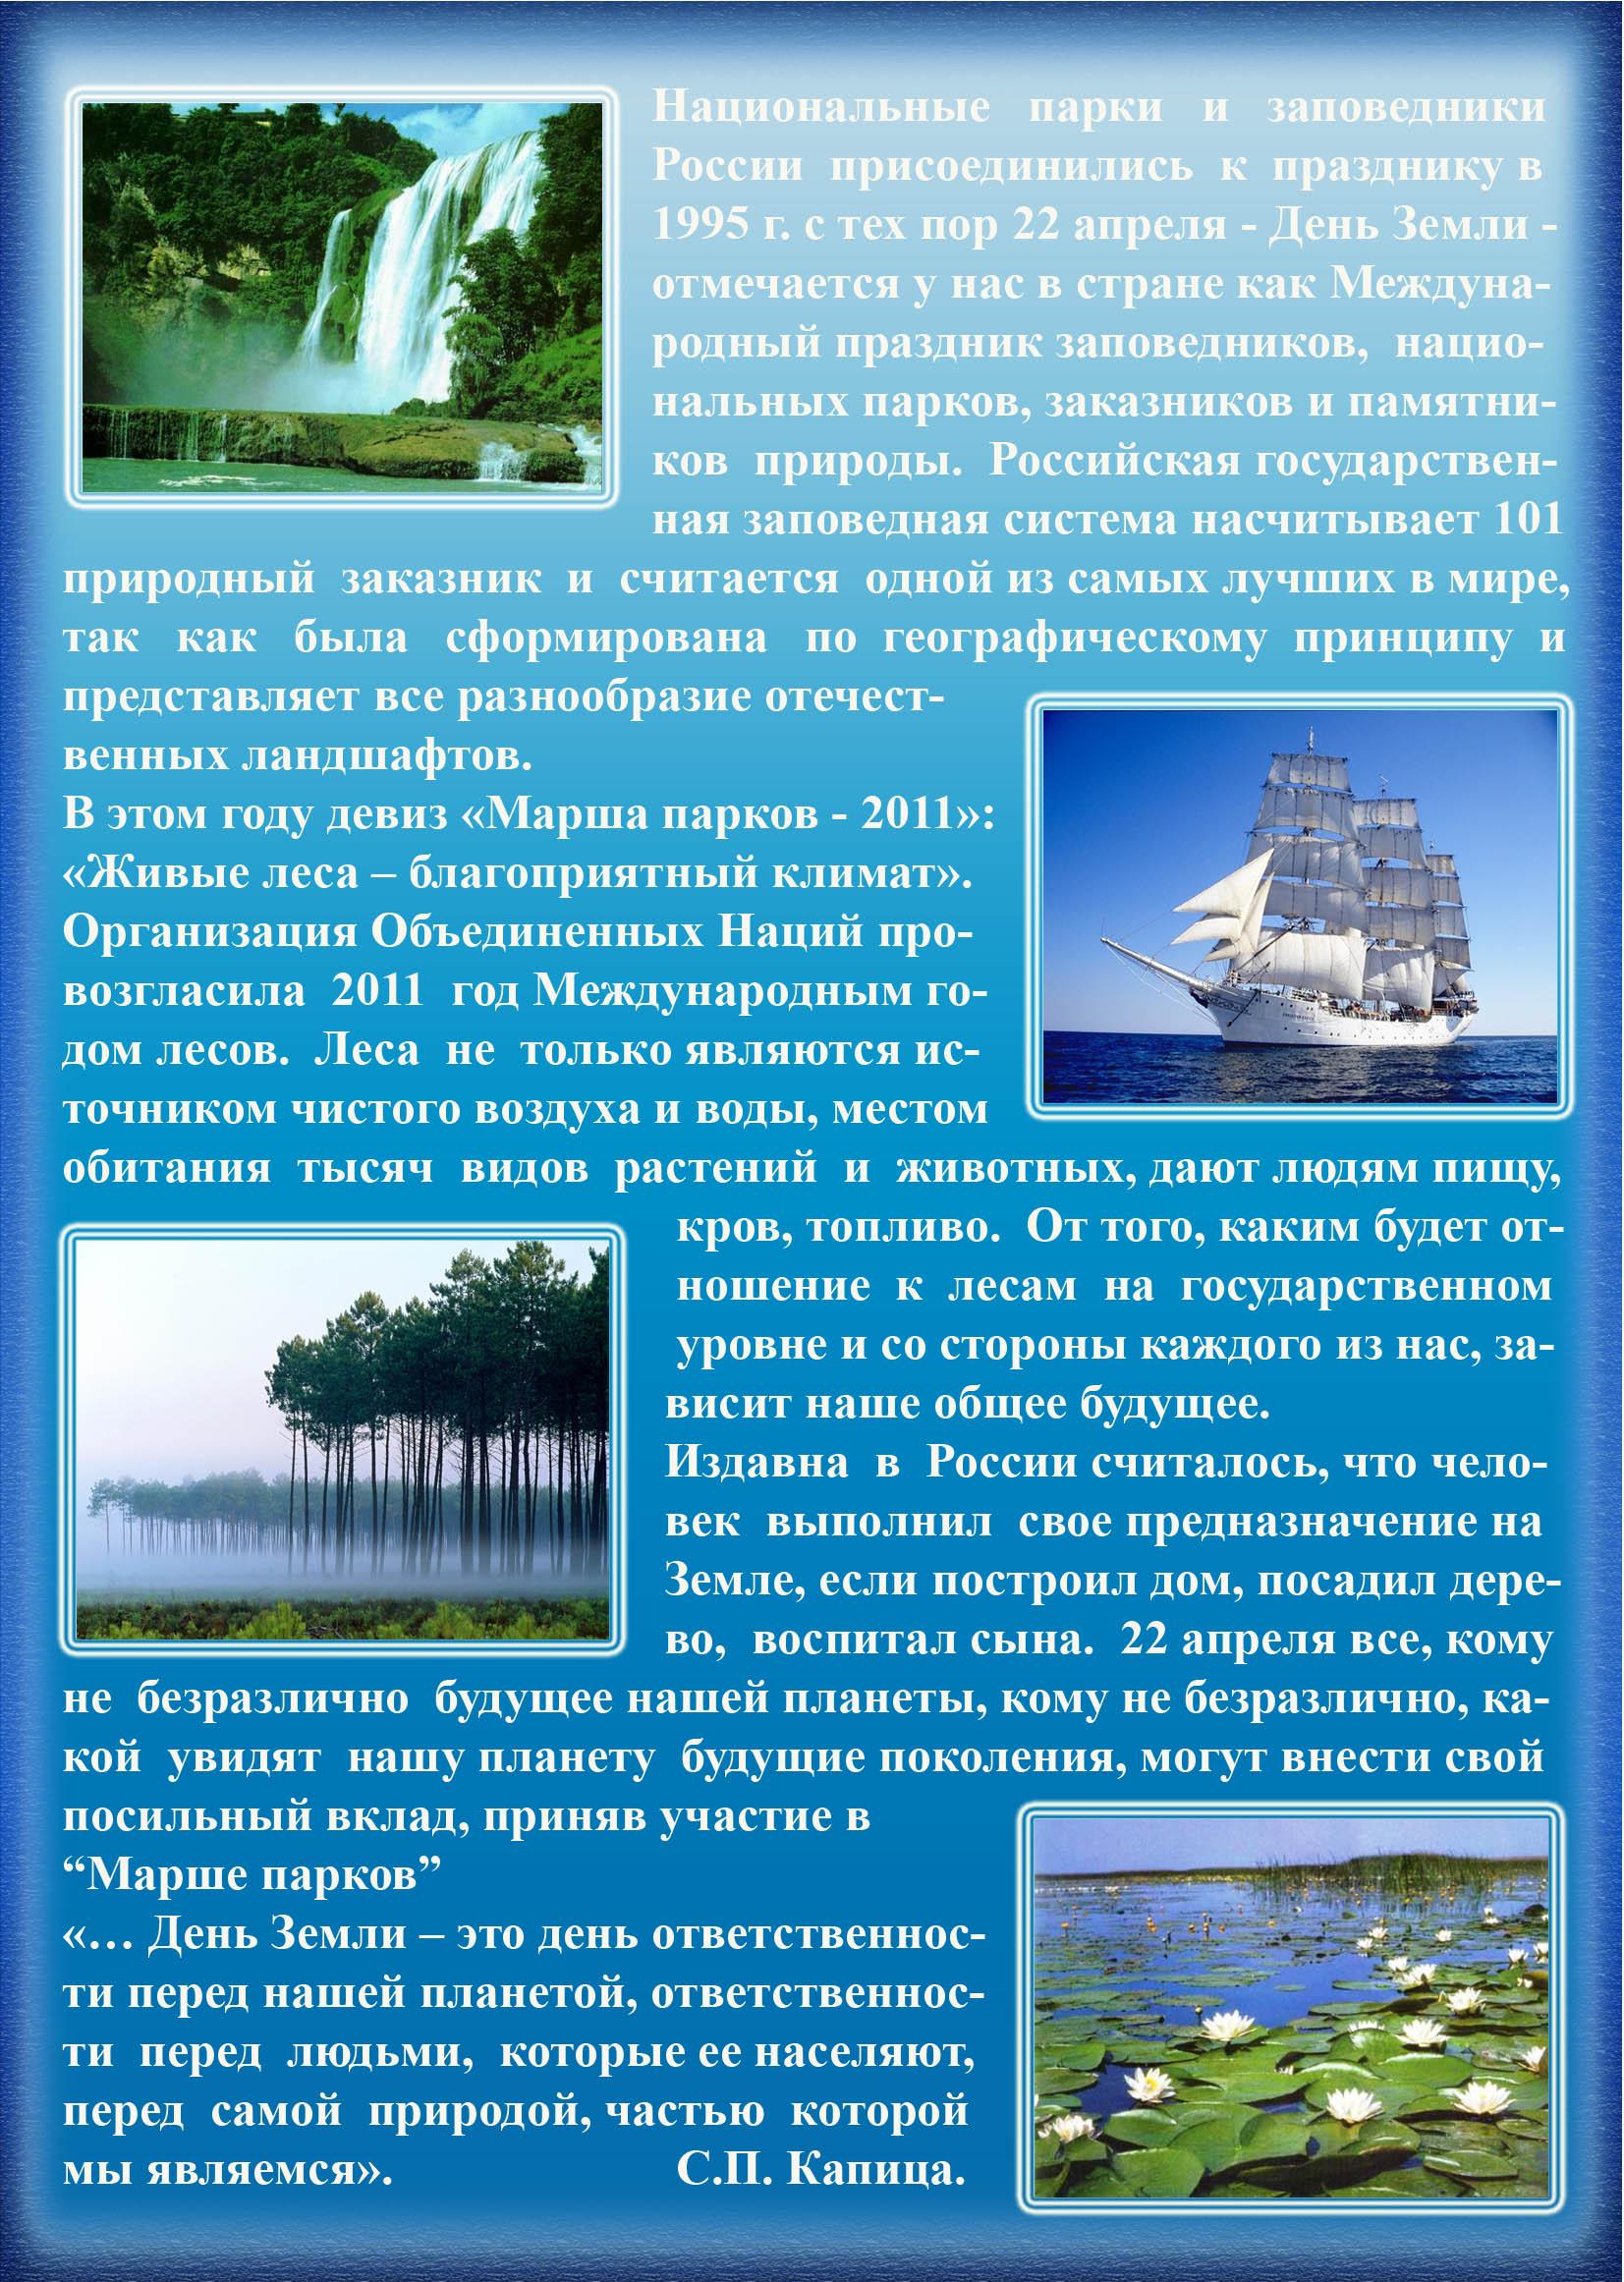 http://i003.radikal.ru/1104/05/bf2d16289db2.jpg